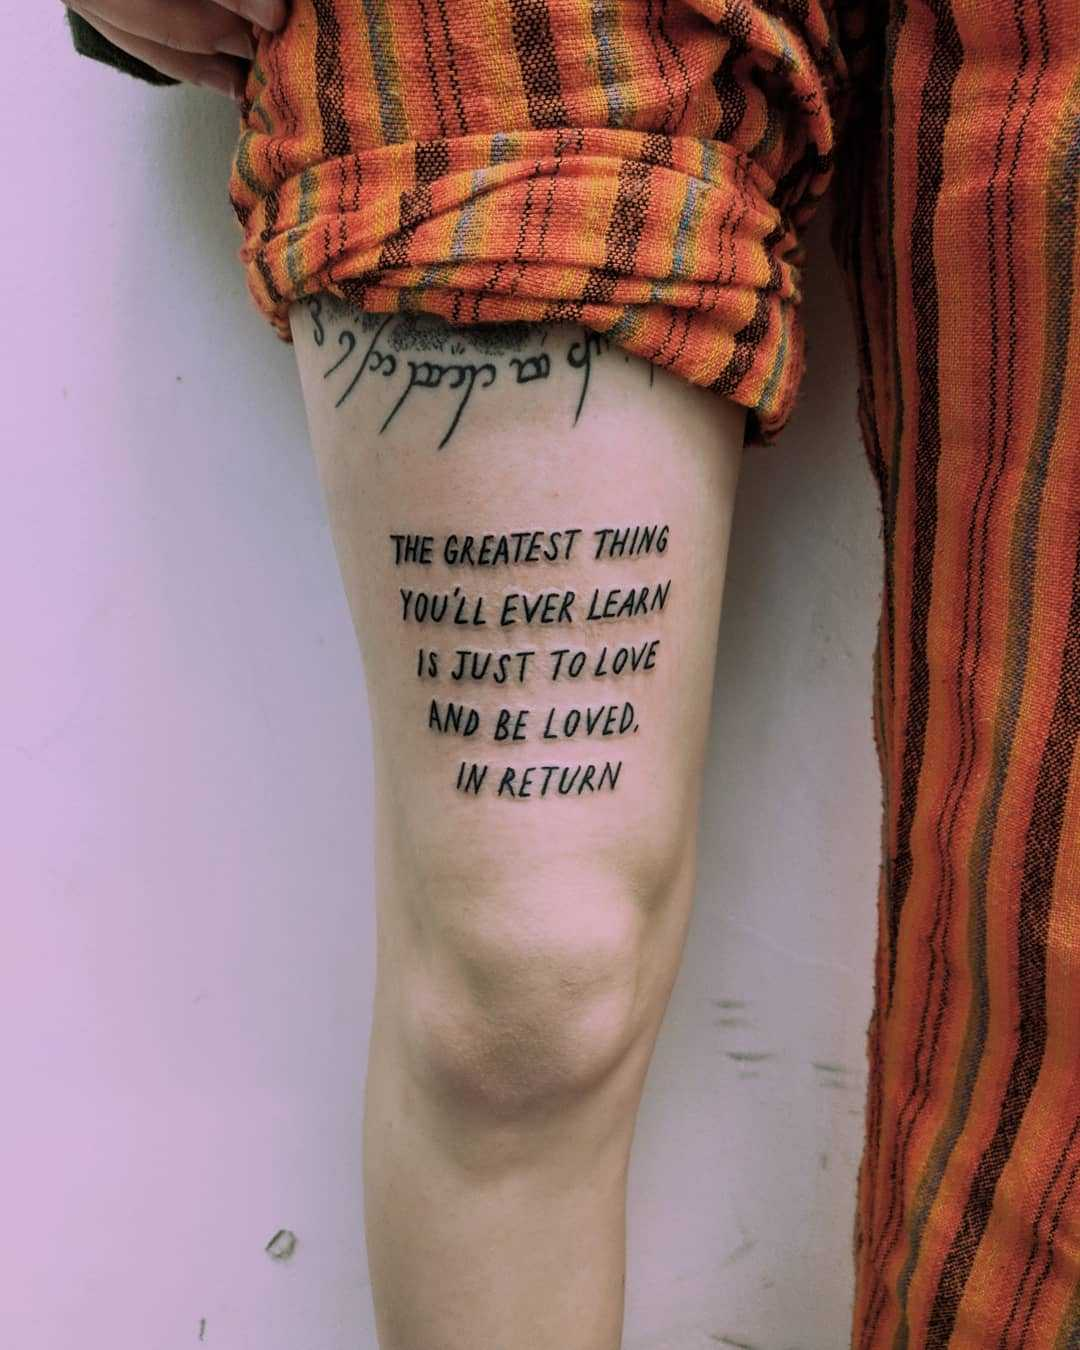 Nat King Cole lyrics by Tristan Ritter